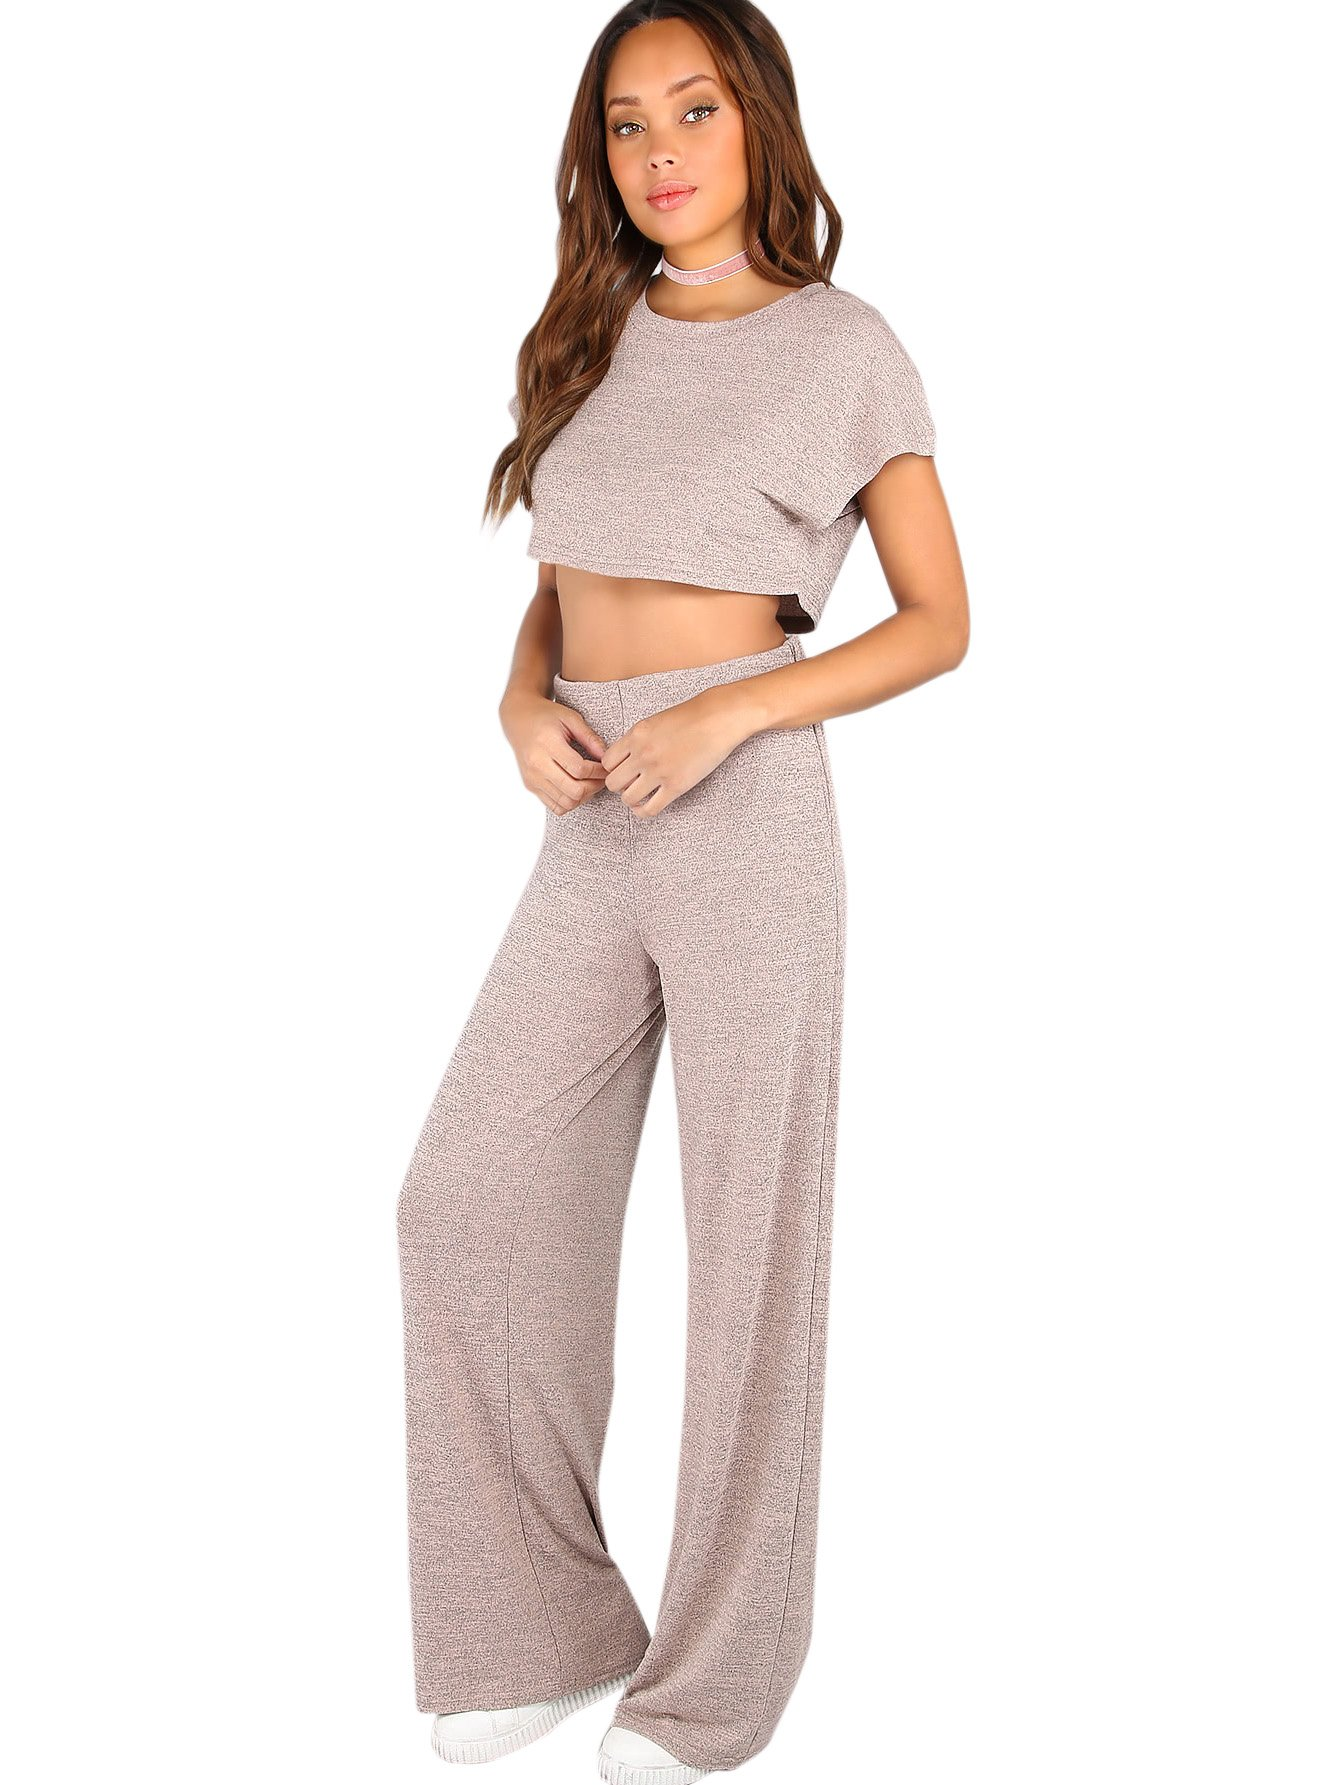 Verdusa Women's Sporty 2 Pieces Sets Loose Crop Top and Wide Leg Pants Blush S